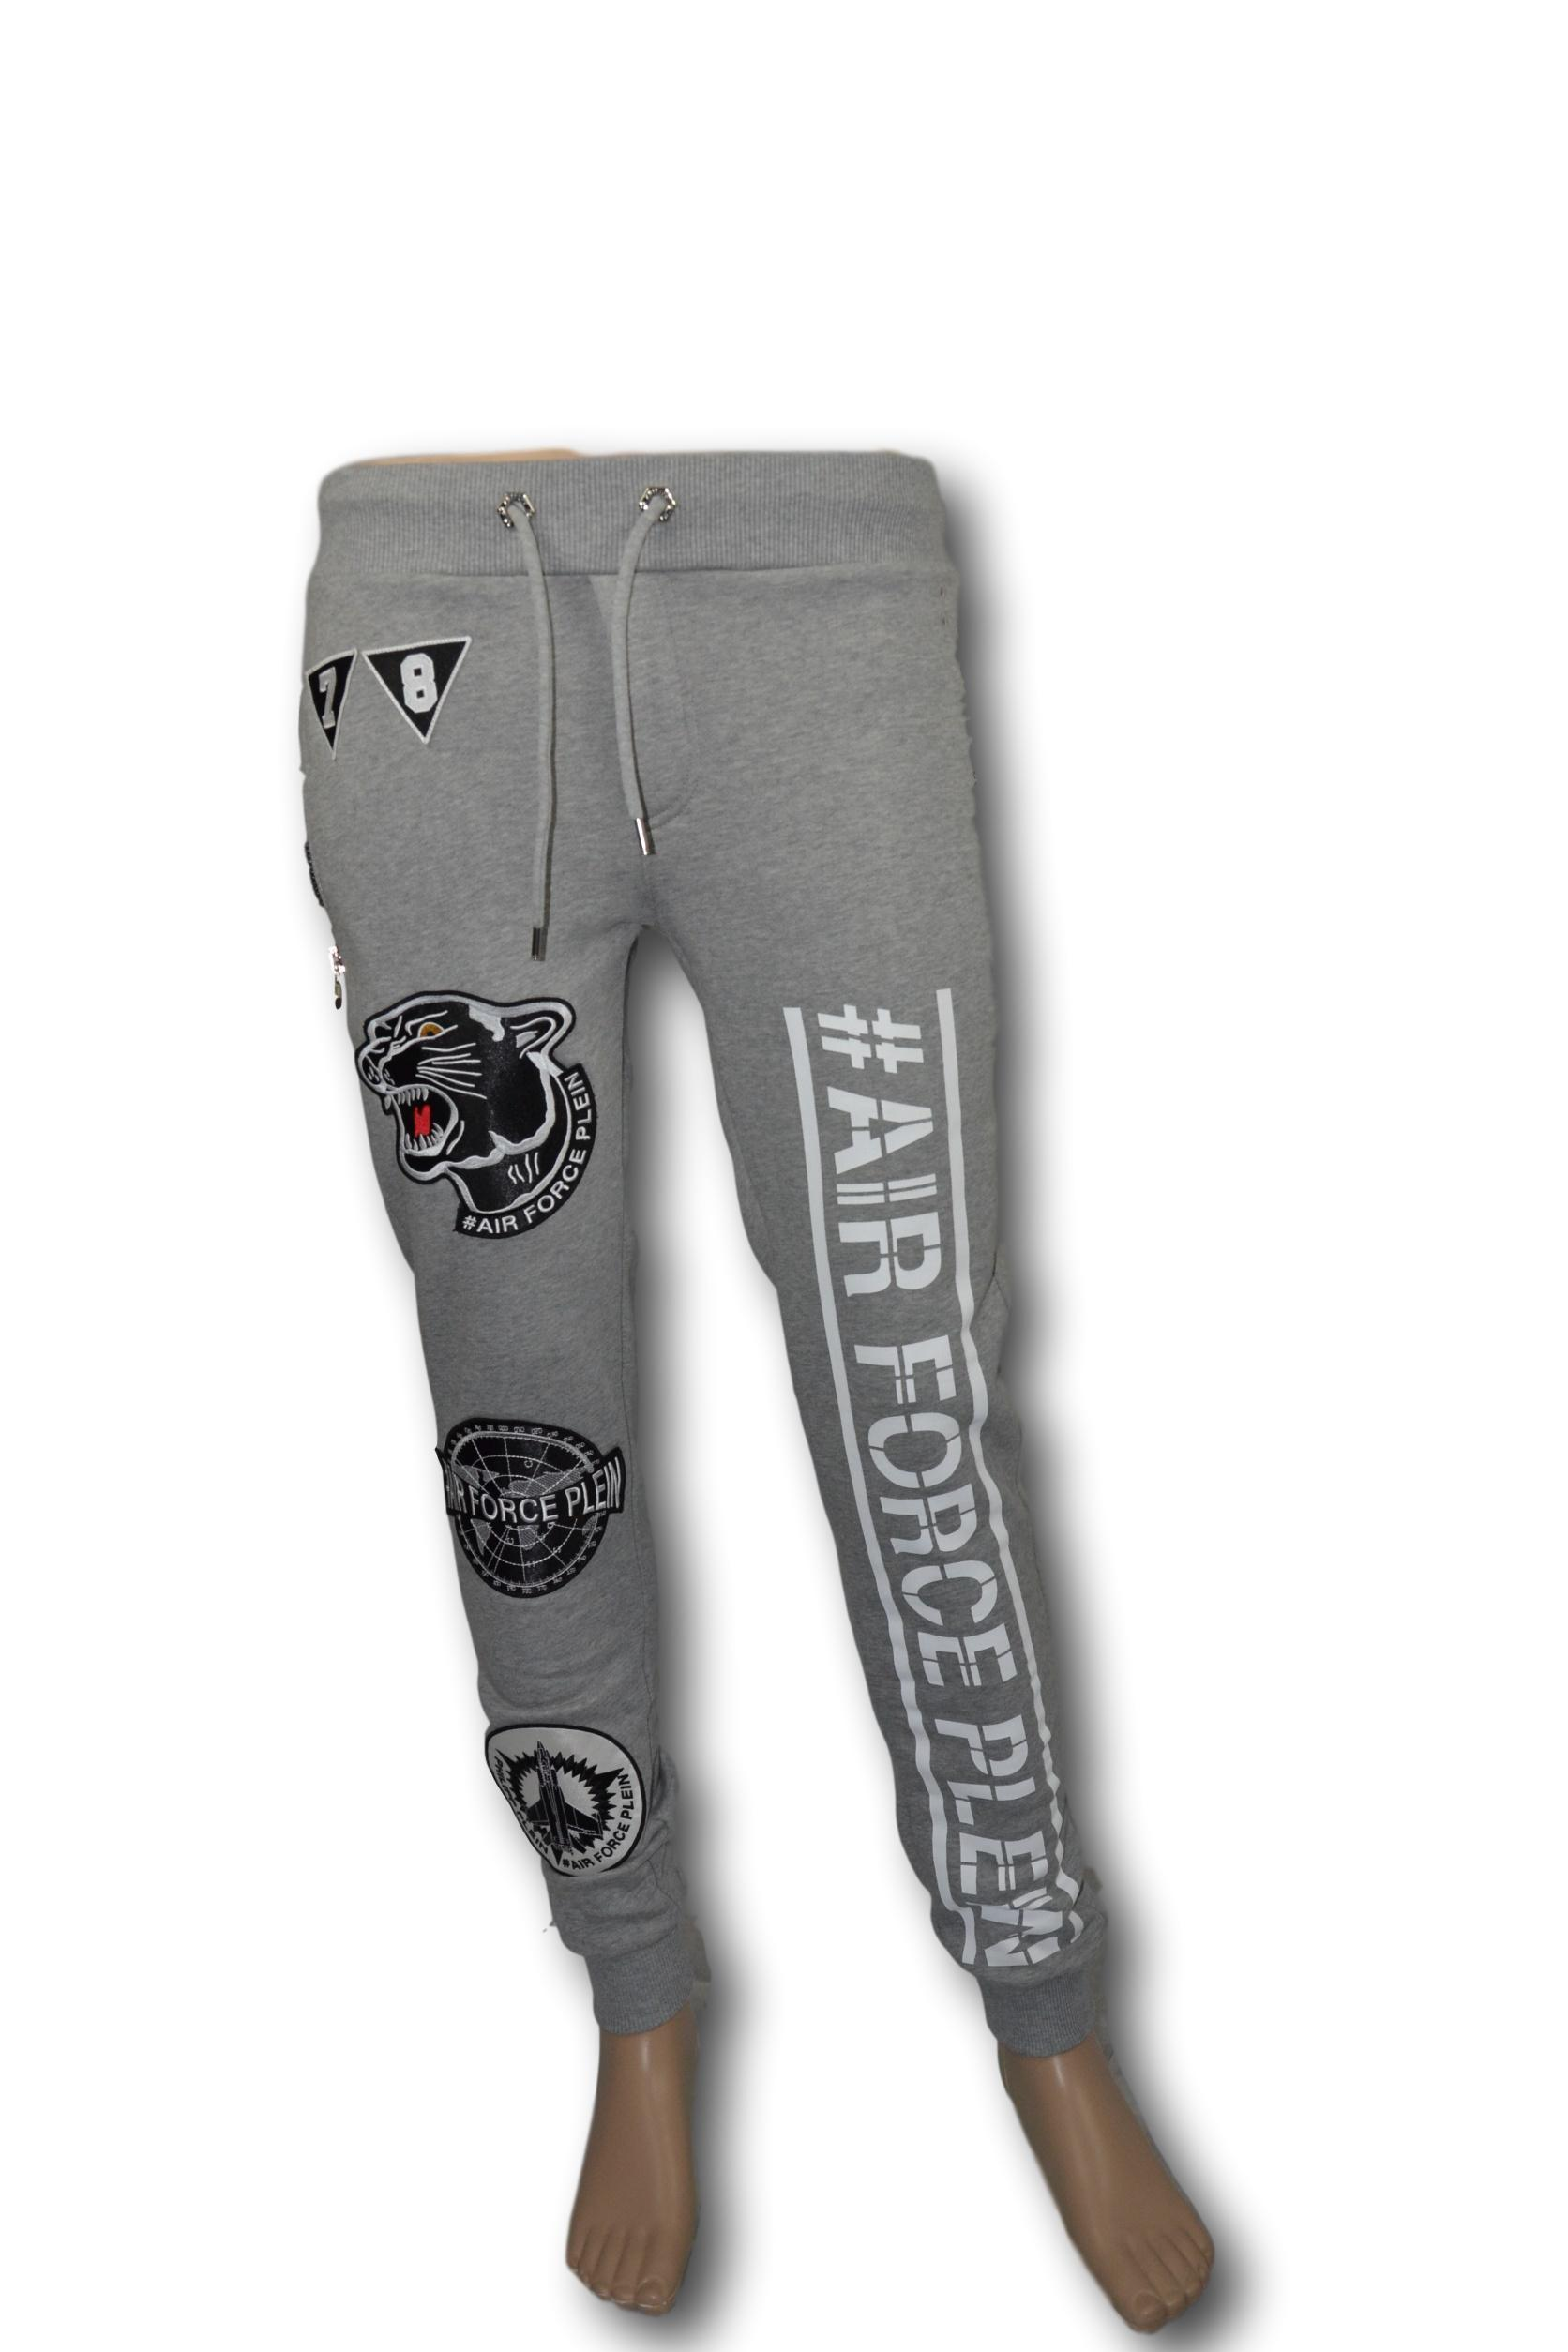 PHILIPP PLEIN Pantalone Tuta Uomo Man Jogging  Air Force Plein Grigio TG. S 7fd538b16d1